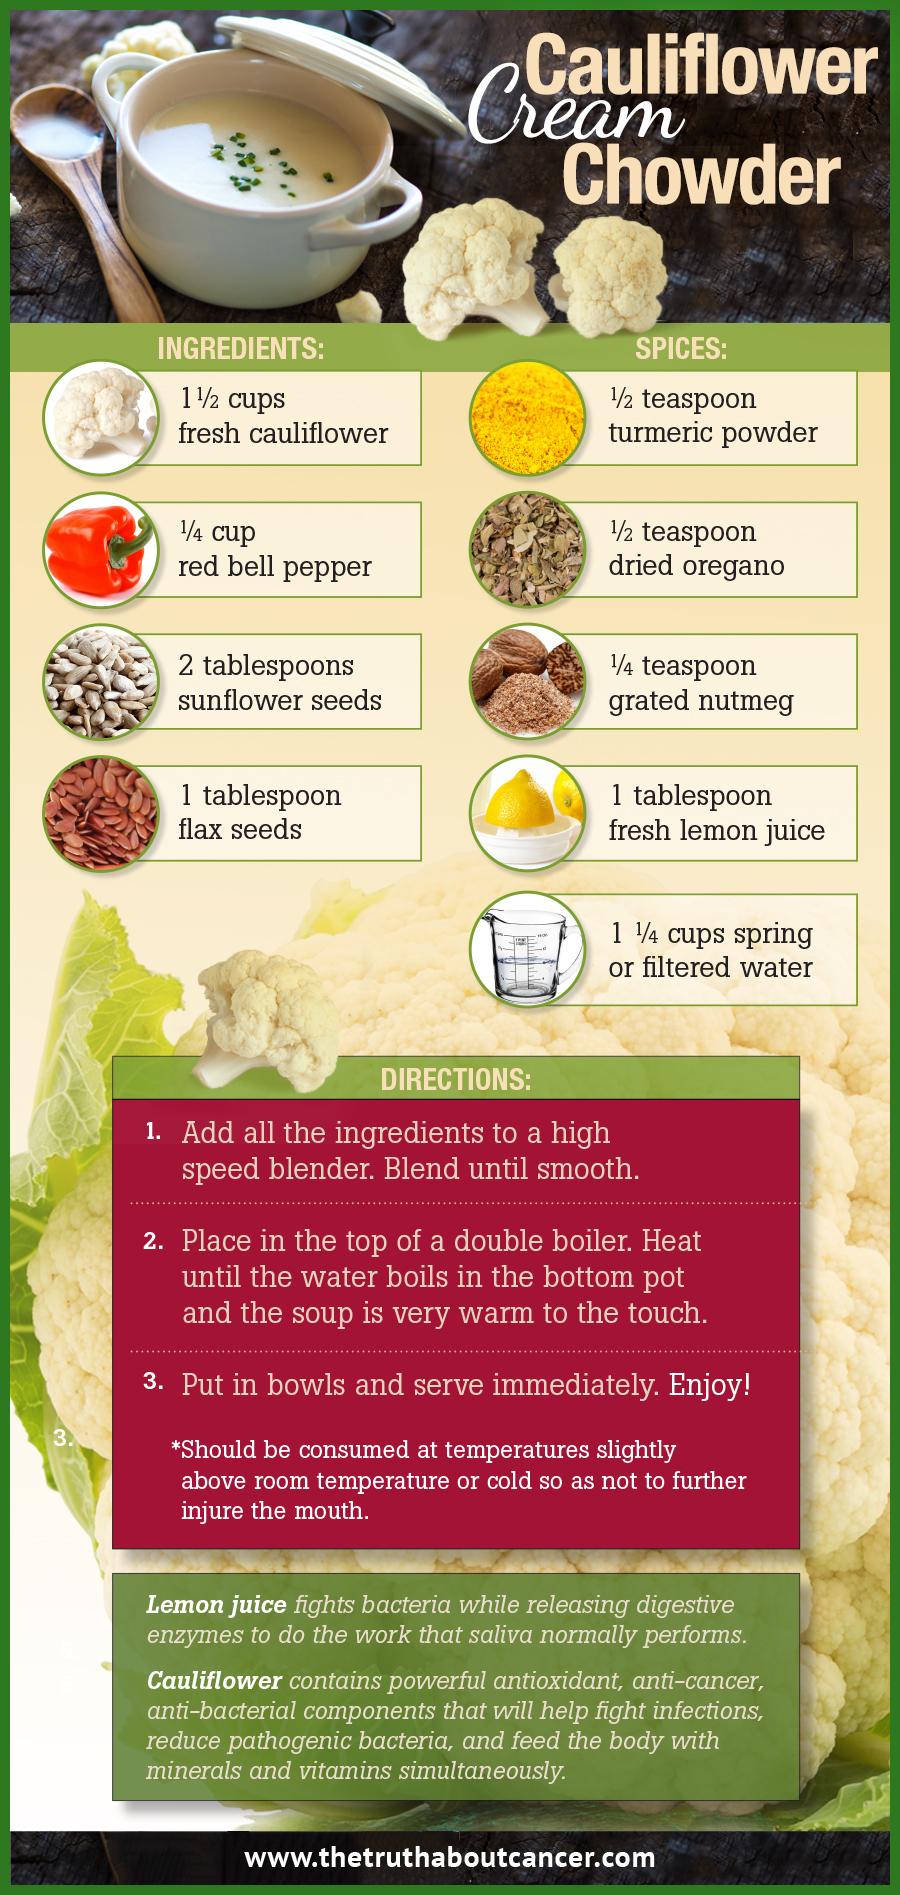 Cauliflower-Cream-Chowder-